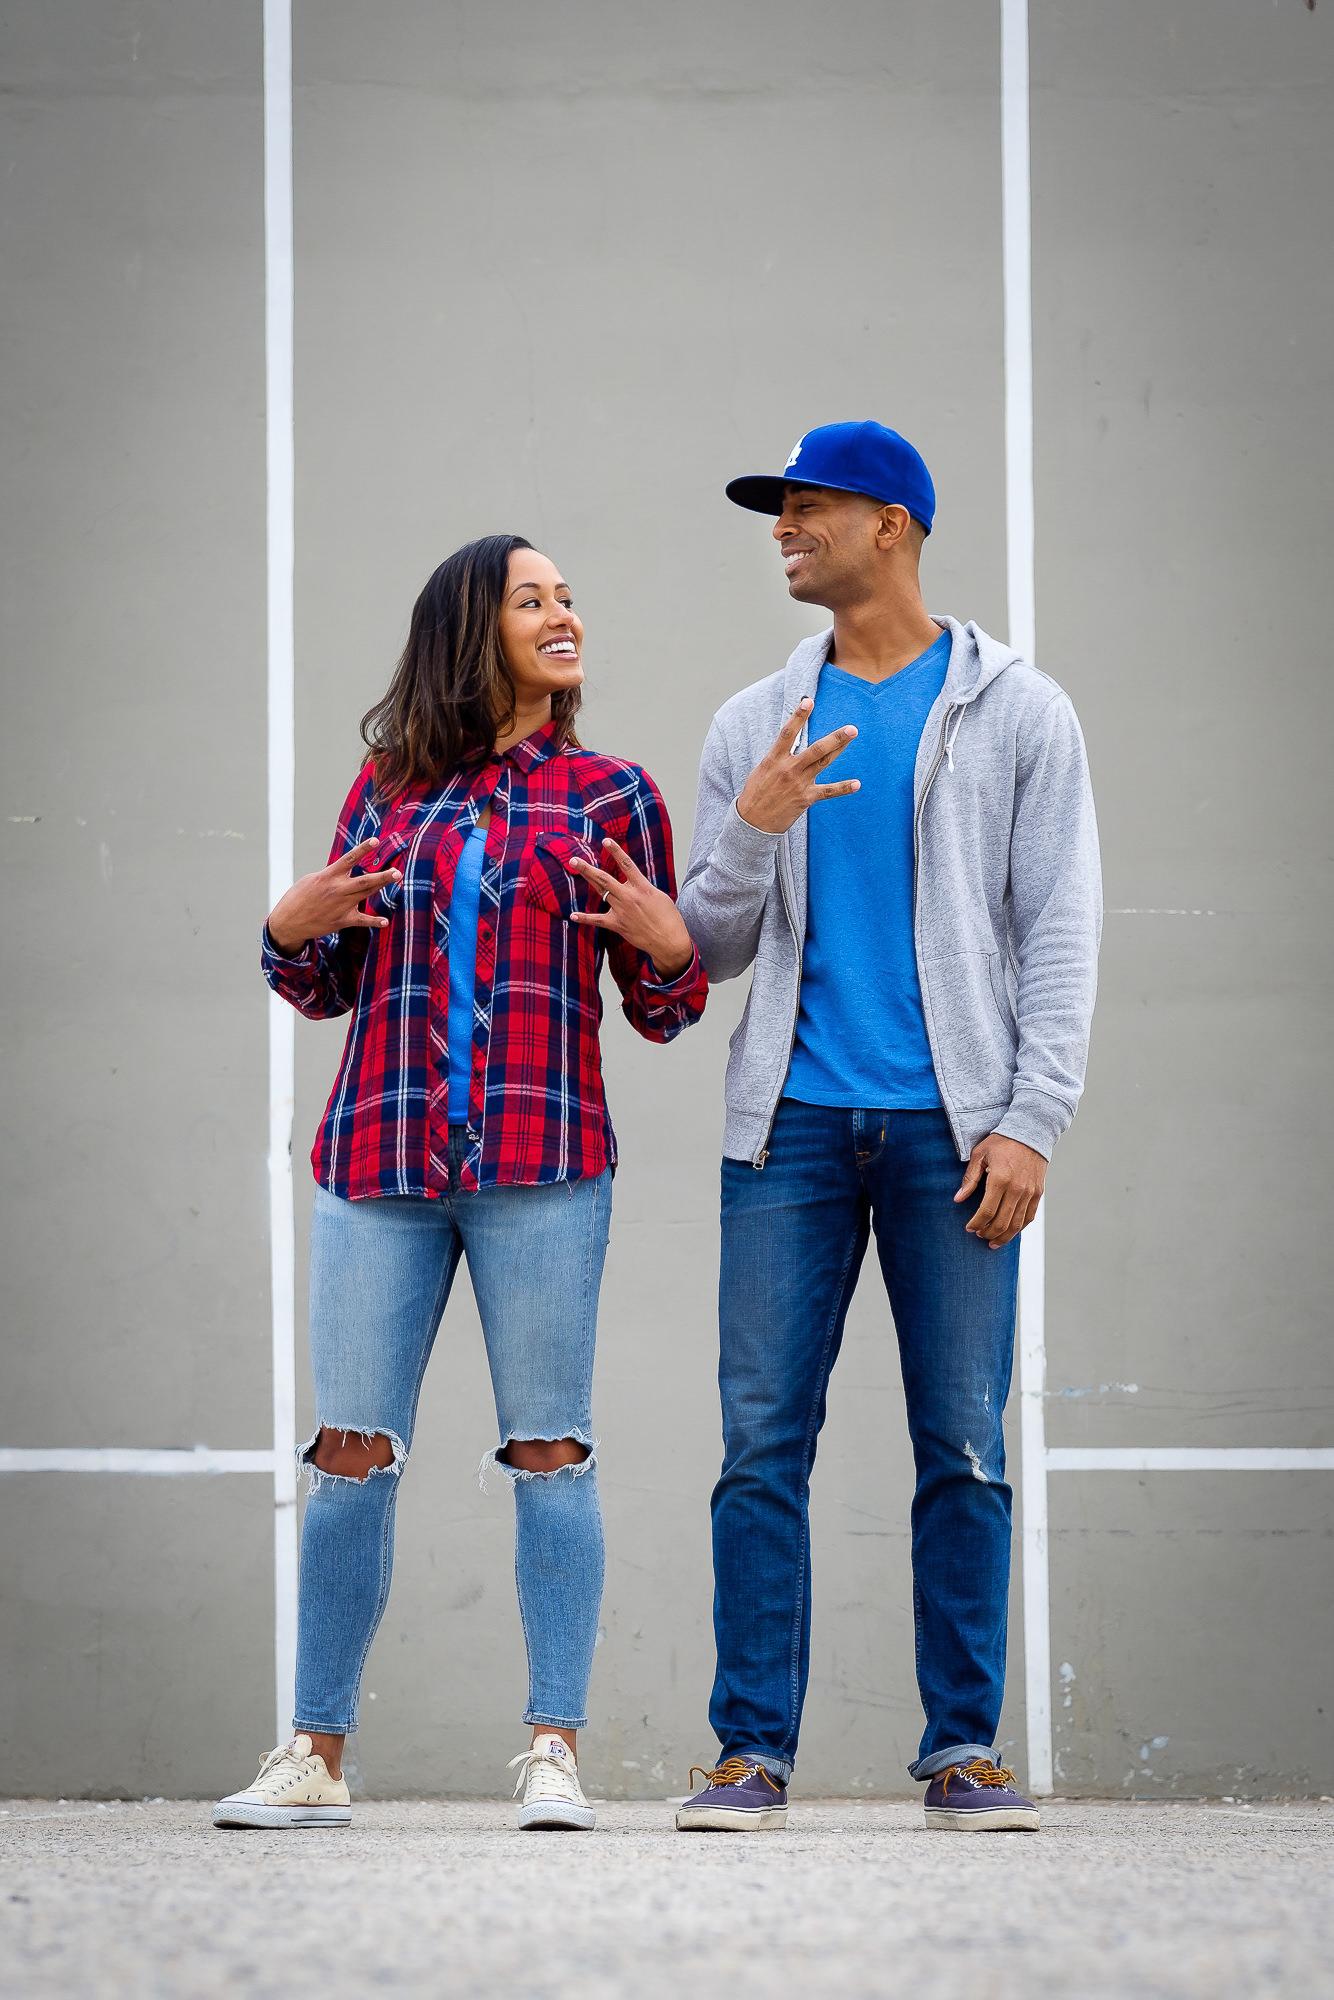 018-christopher-jason-studios-venice-beach-california-engagement-session-african-american-couple-embraces-under-palm-trees-2.jpg